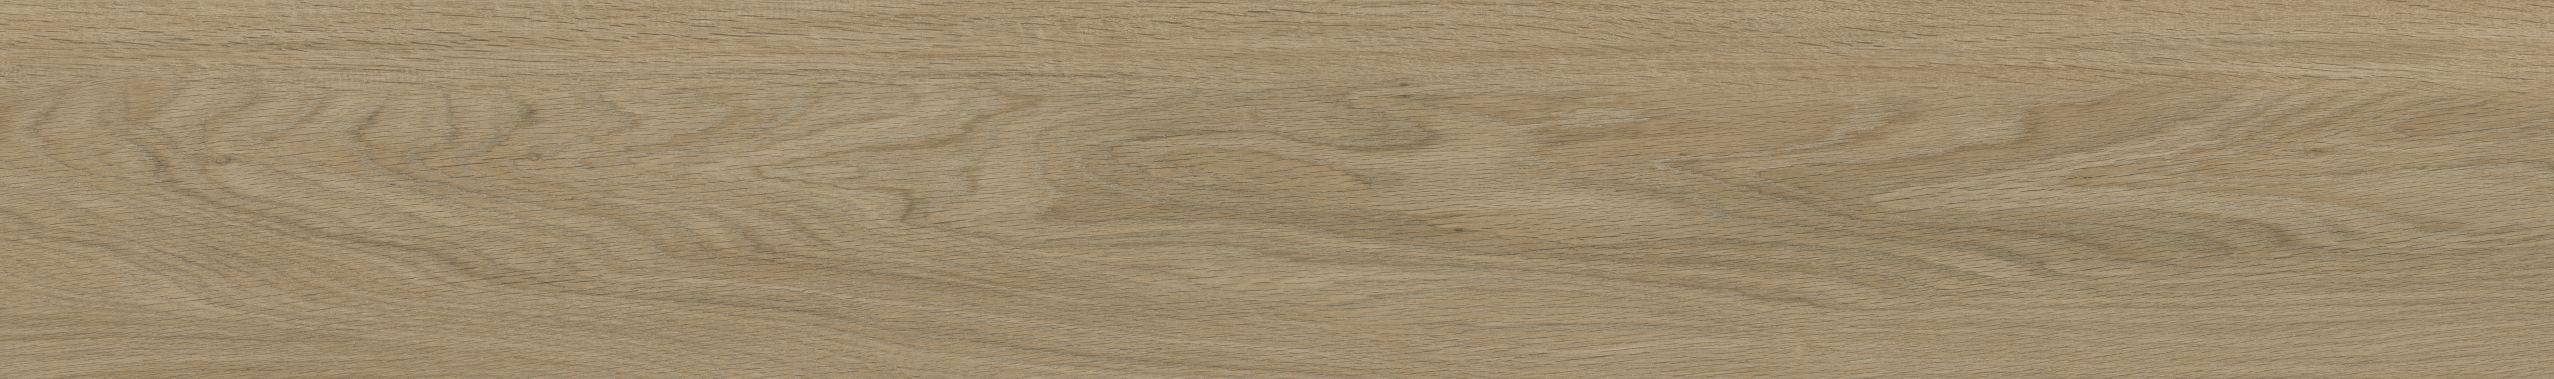 Panele winylowe LVT modulari ® WOOD DRYBACK 19,6 x 132 cm 24236